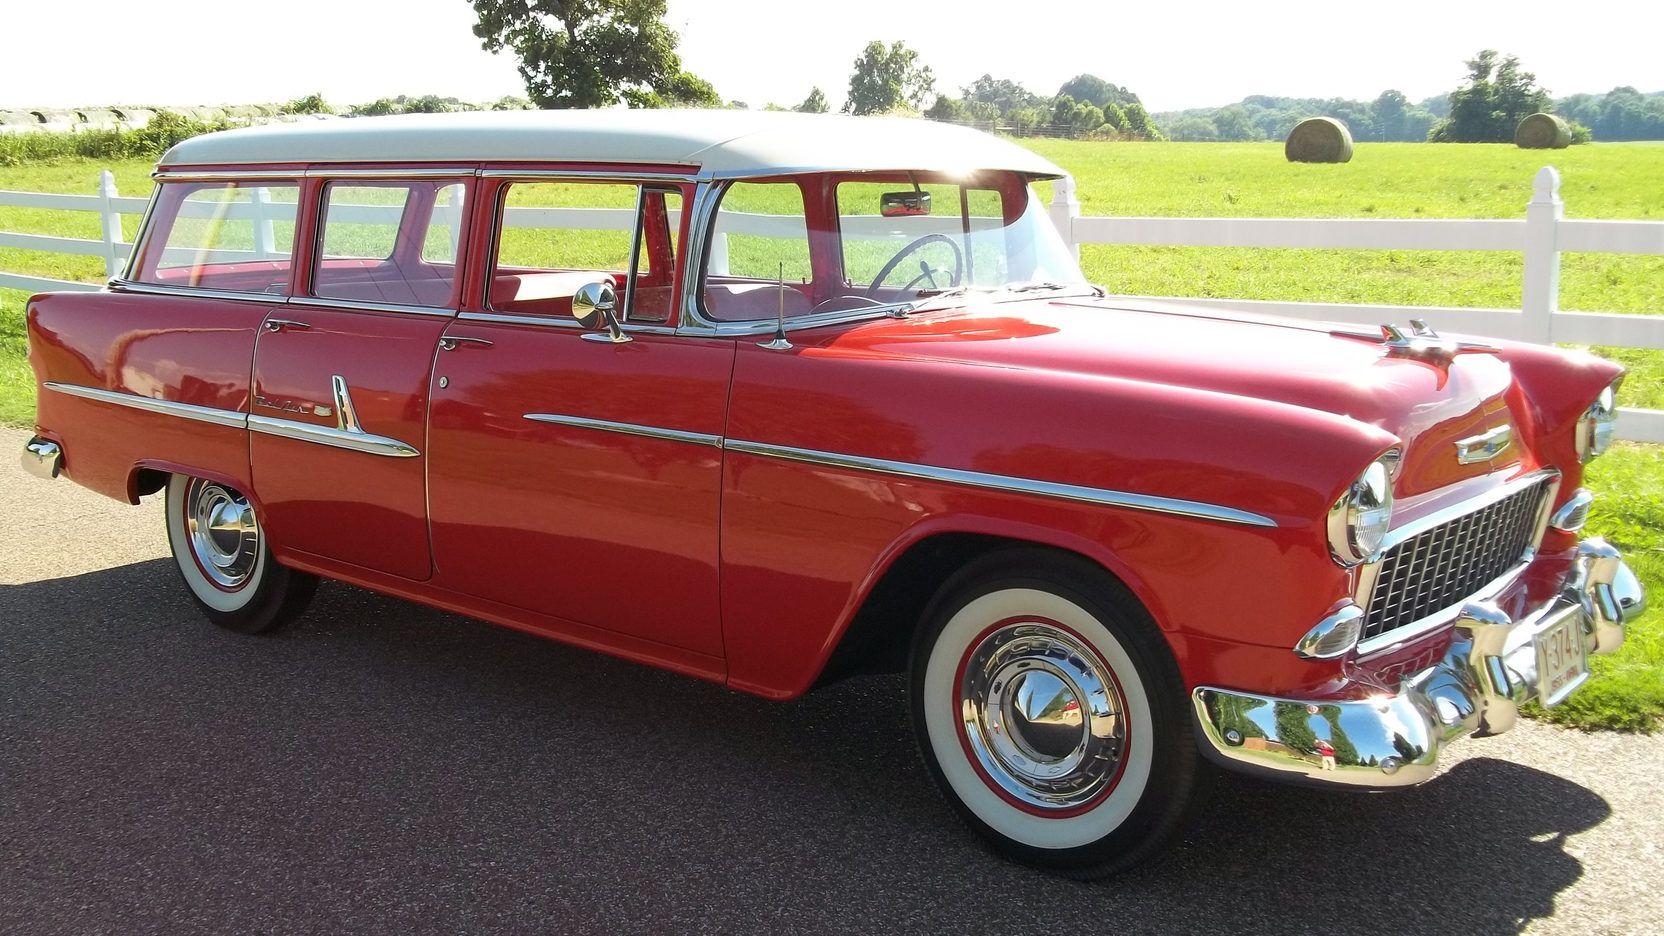 1955 Chevrolet Bel Air Station Wagon 265 2bbl V8 2sp Powerglide